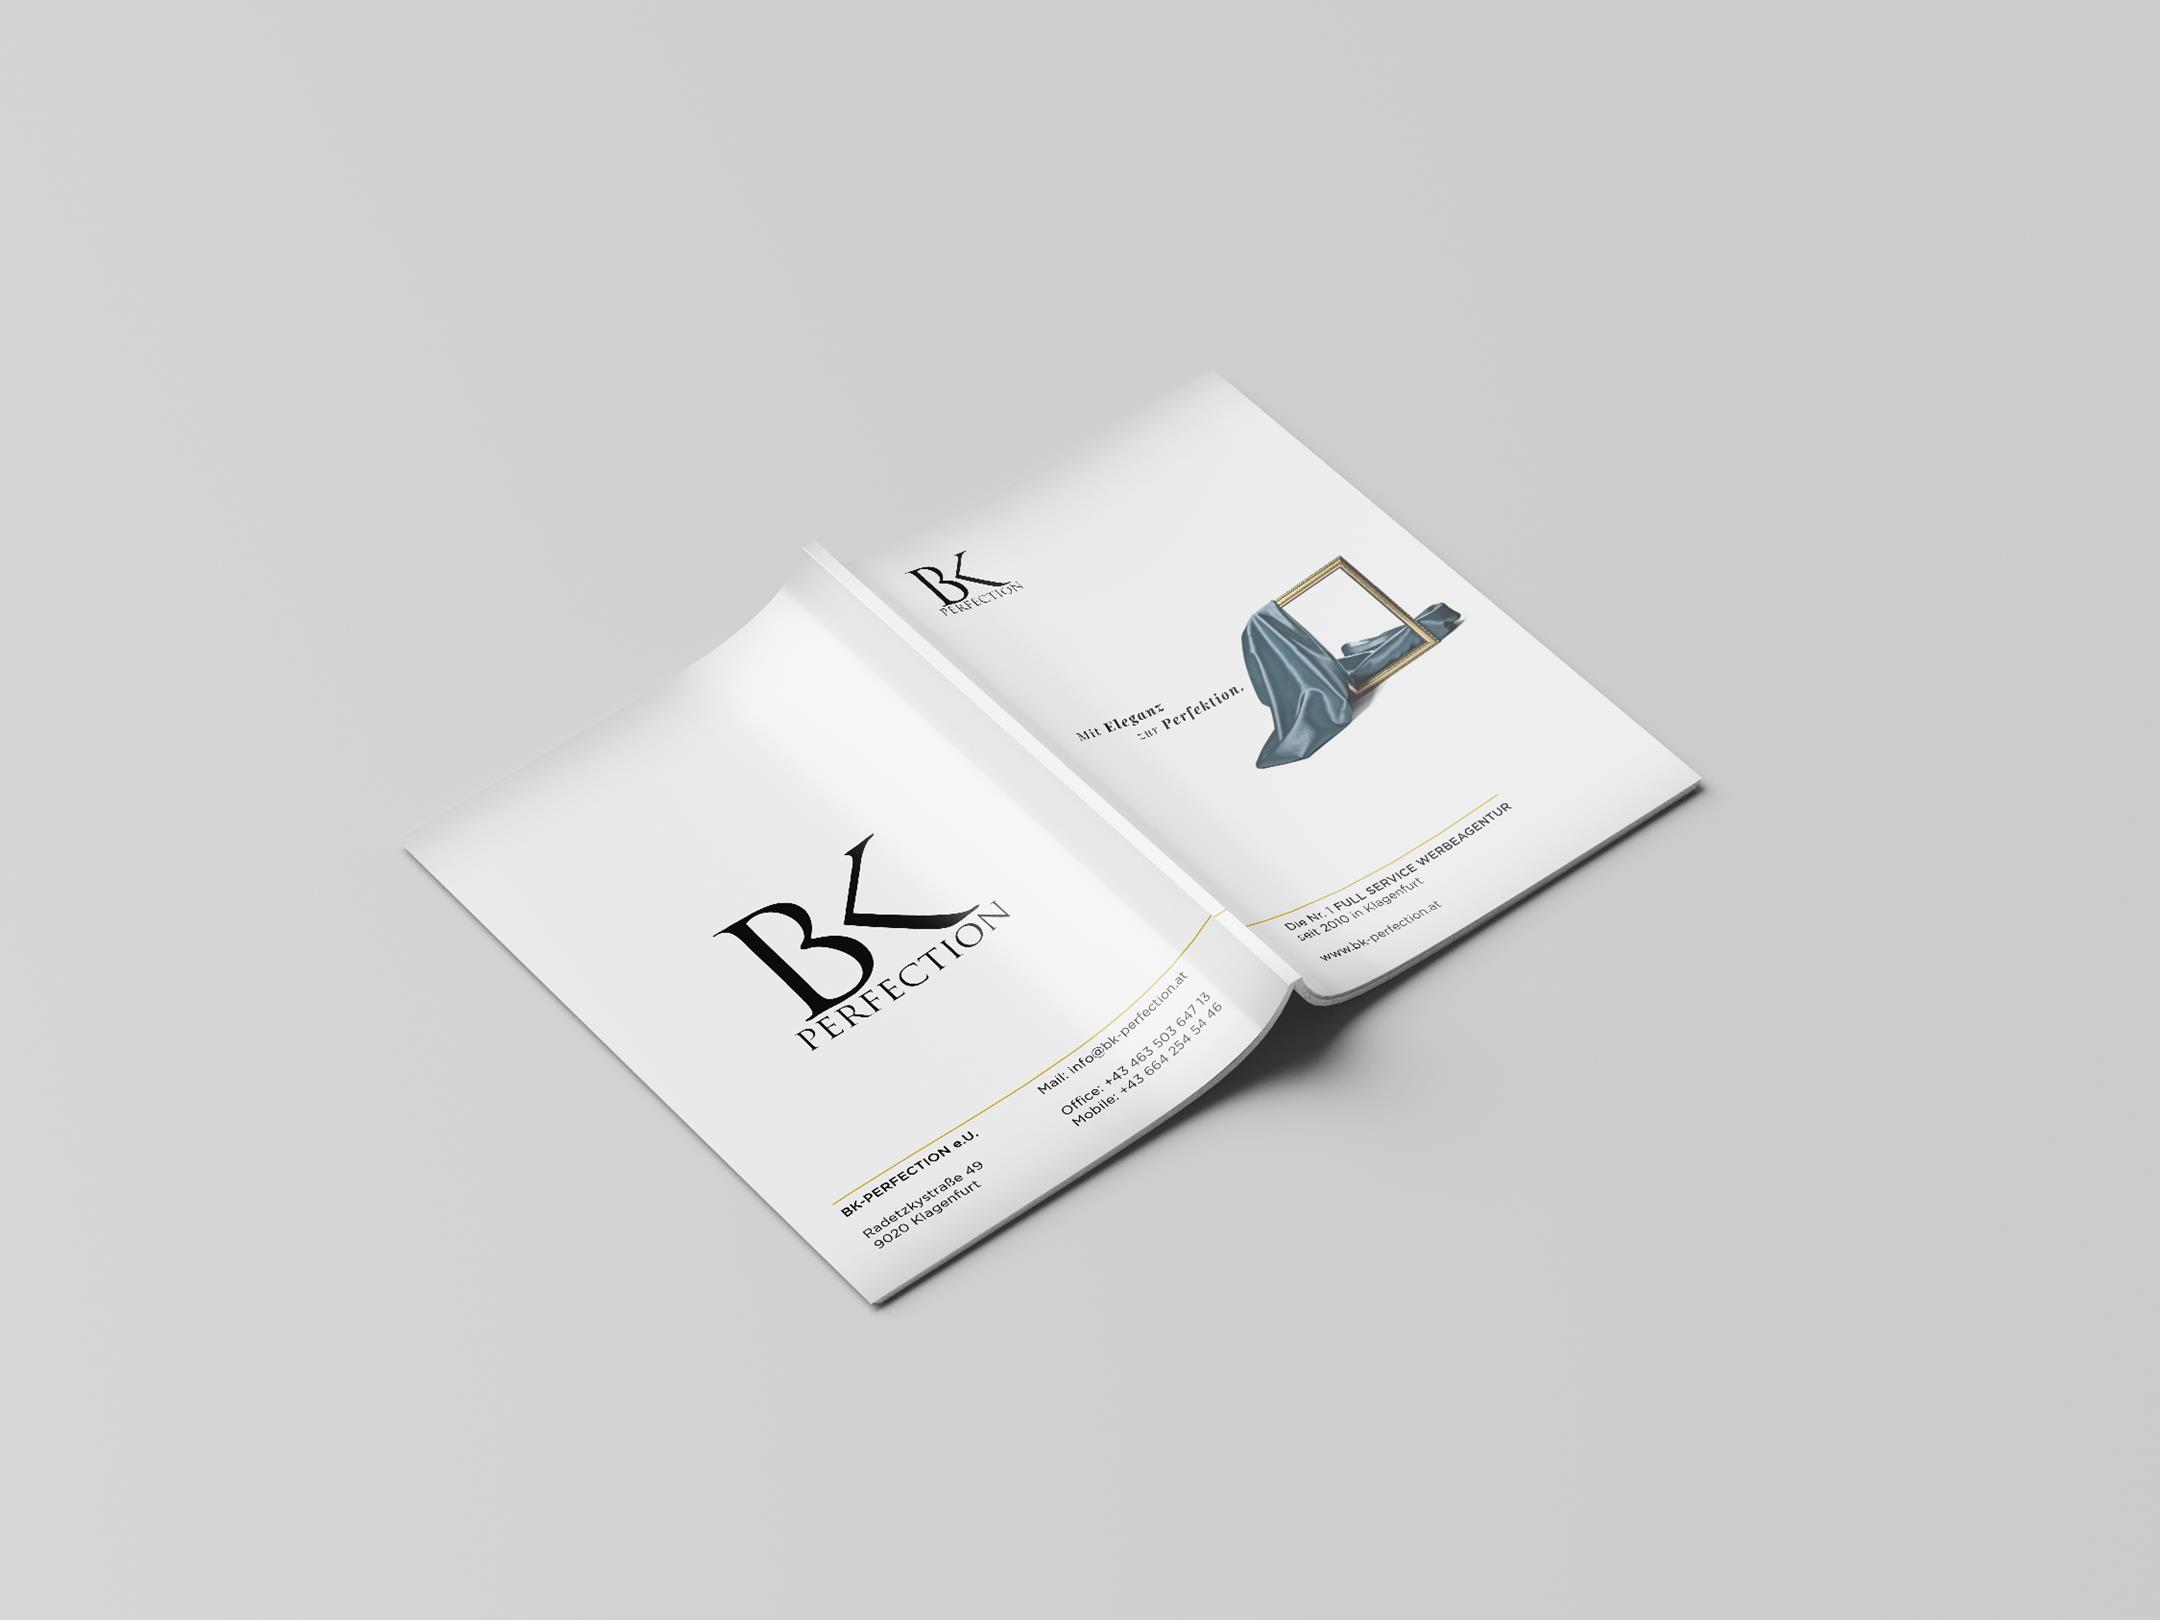 -bk-perfection-broschüre-mockup-52160×1620